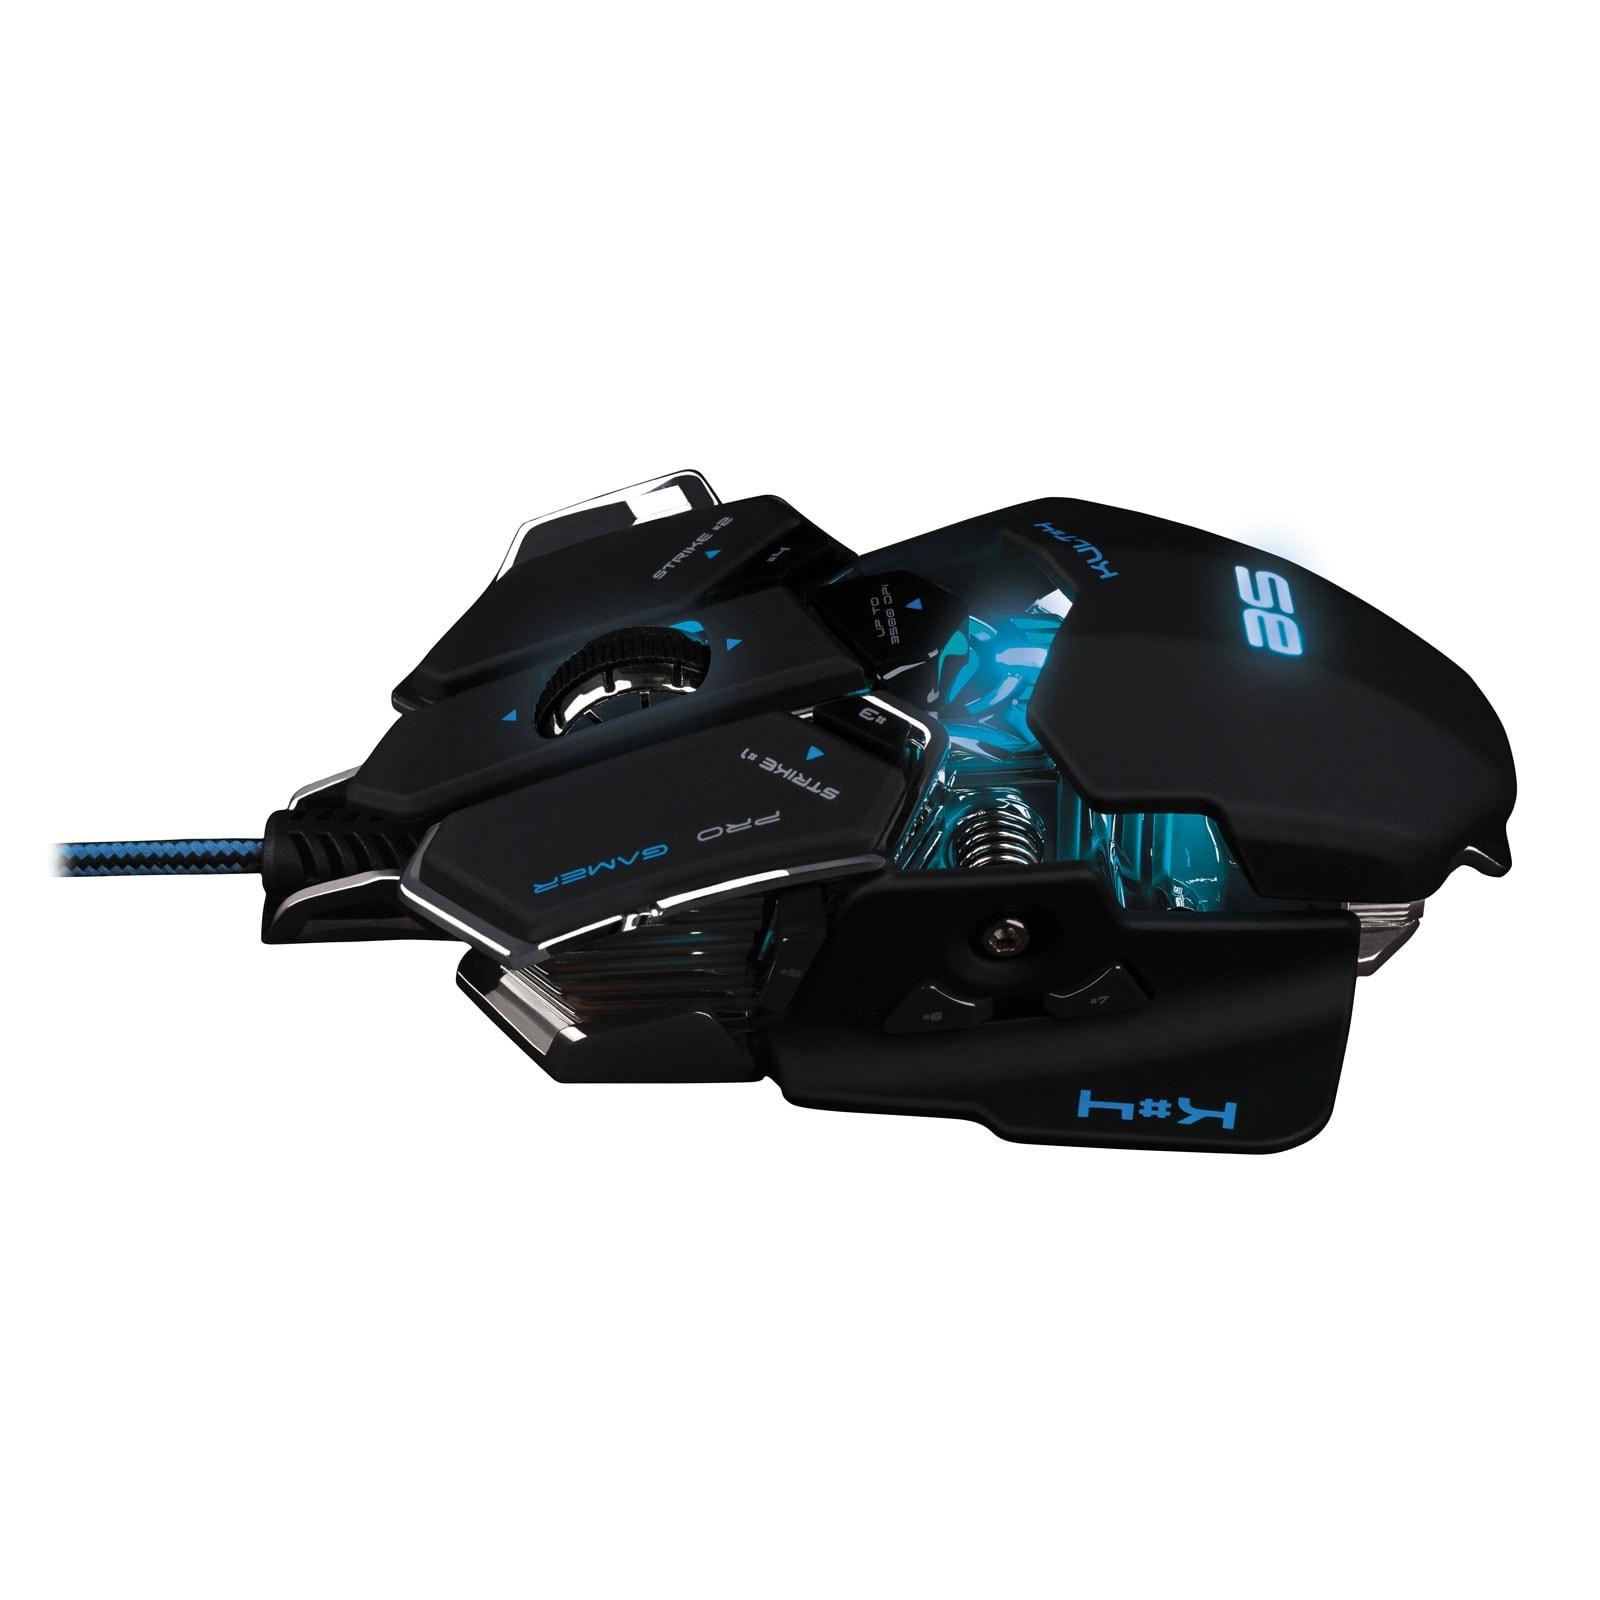 Bluestork KULT 4 BLACK ED. (BS-GM-KULT4) - Achat / Vente Souris PC sur Cybertek.fr - 3